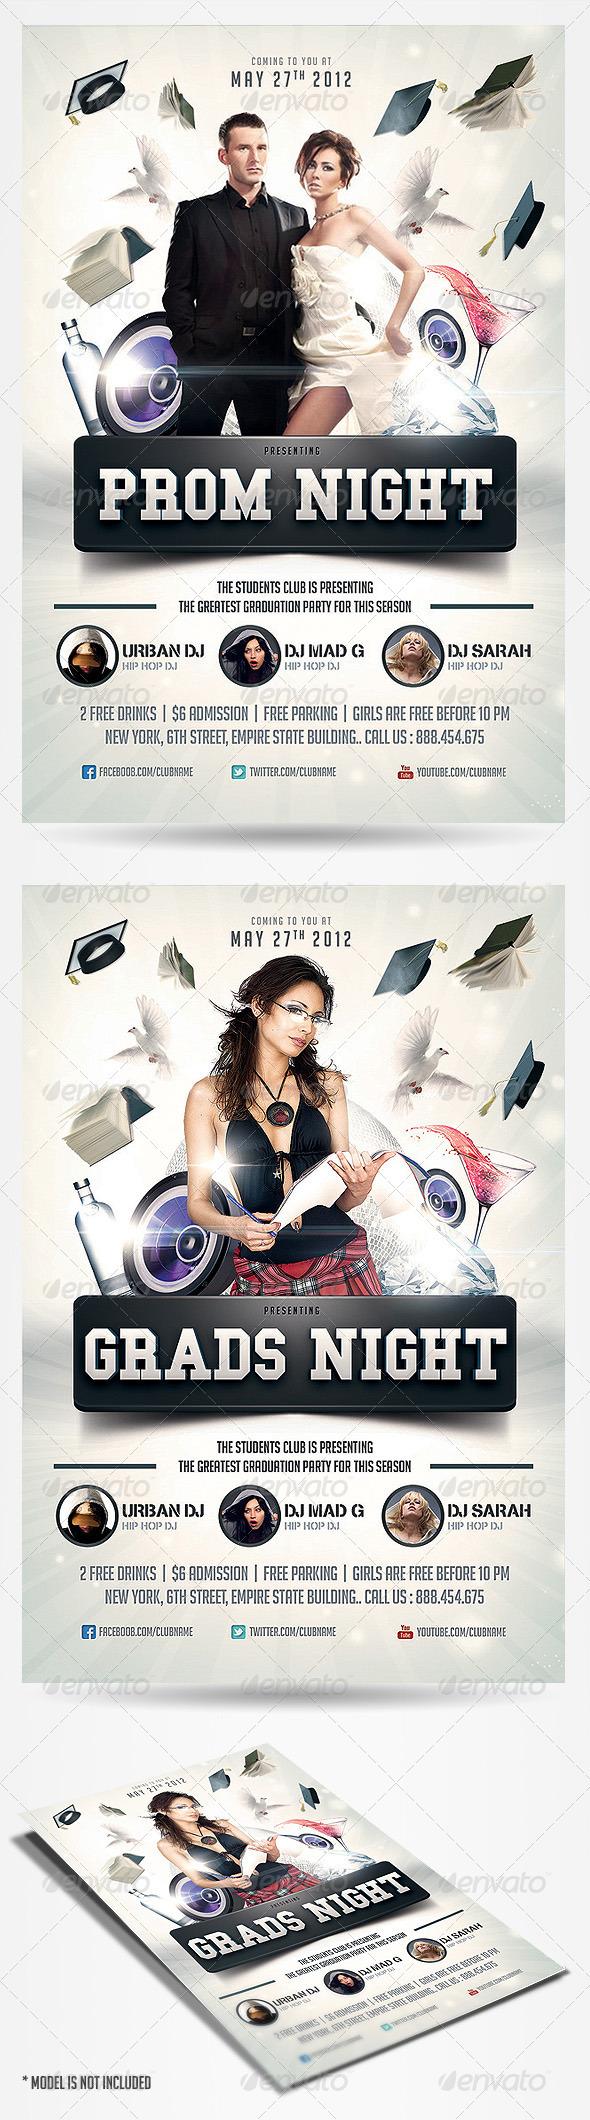 Graduation Prom Flyer - Flyers Print Templates